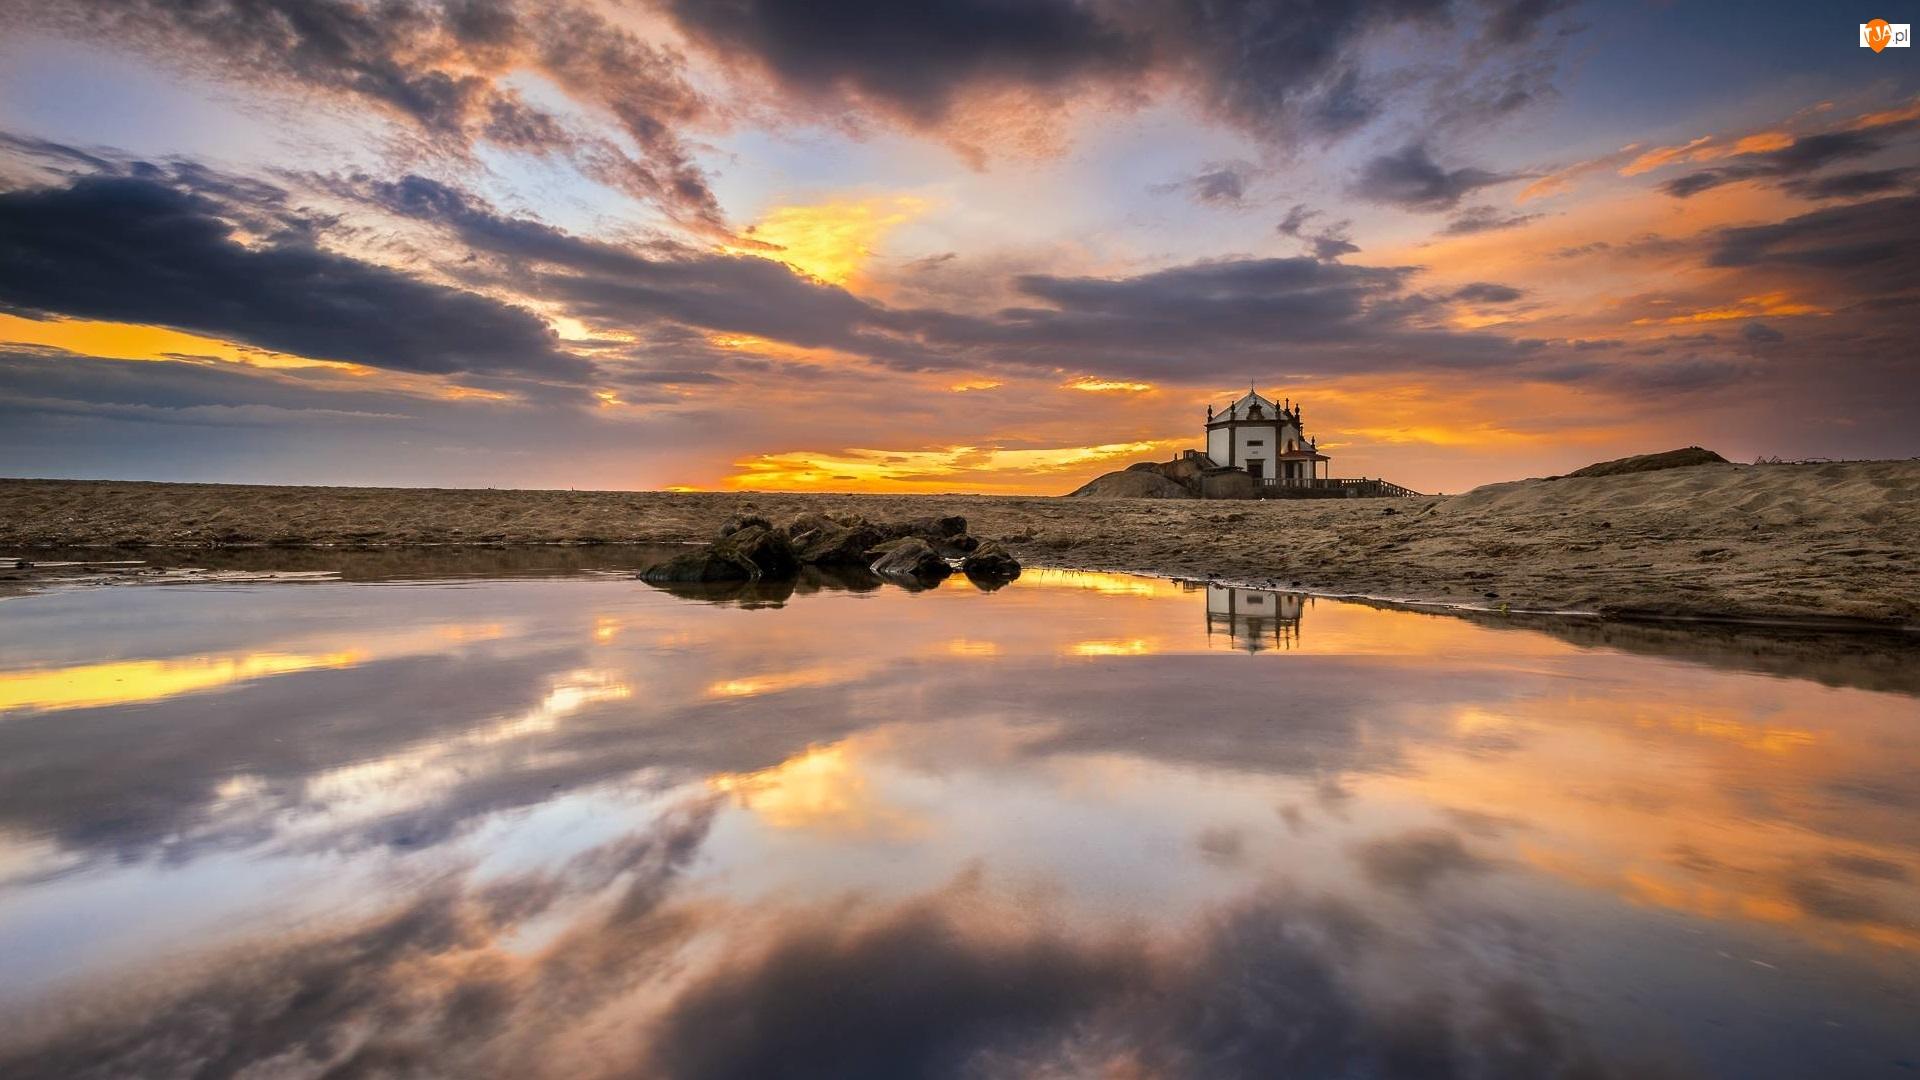 Chmury, Miramar, Zachód słońca, Morze, Skały, Kapliczka, Kościół, Portugalia, Capela do Senhor da Pedra